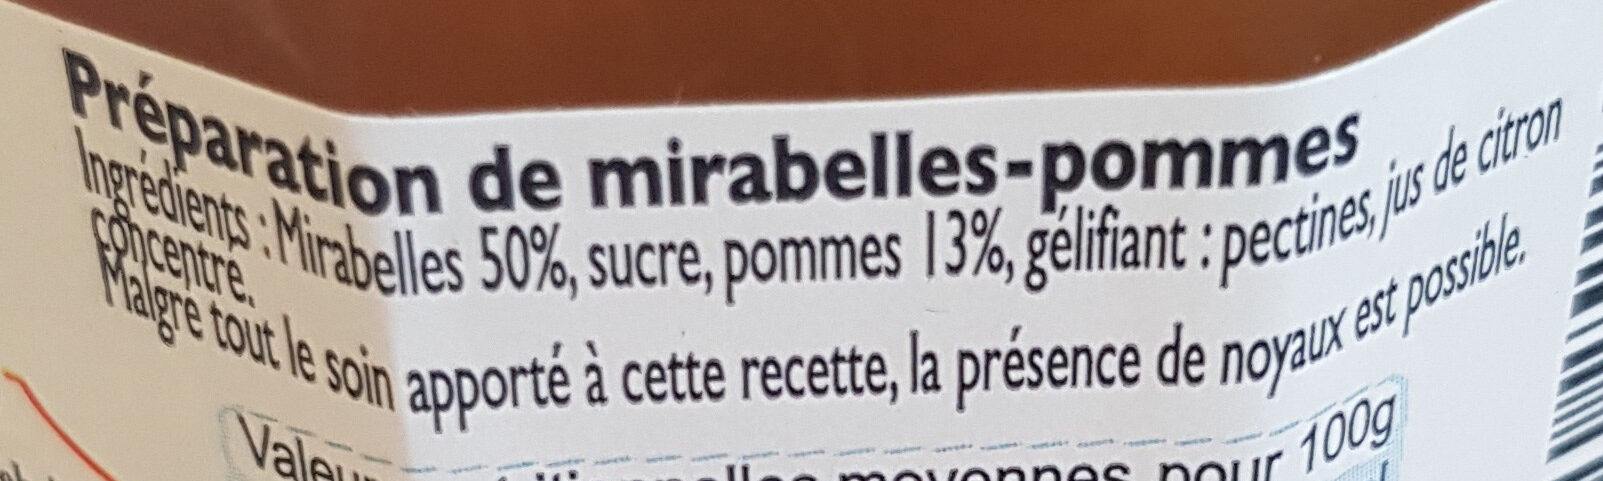 Mirabelle cuite au chaudron - Ingrediënten